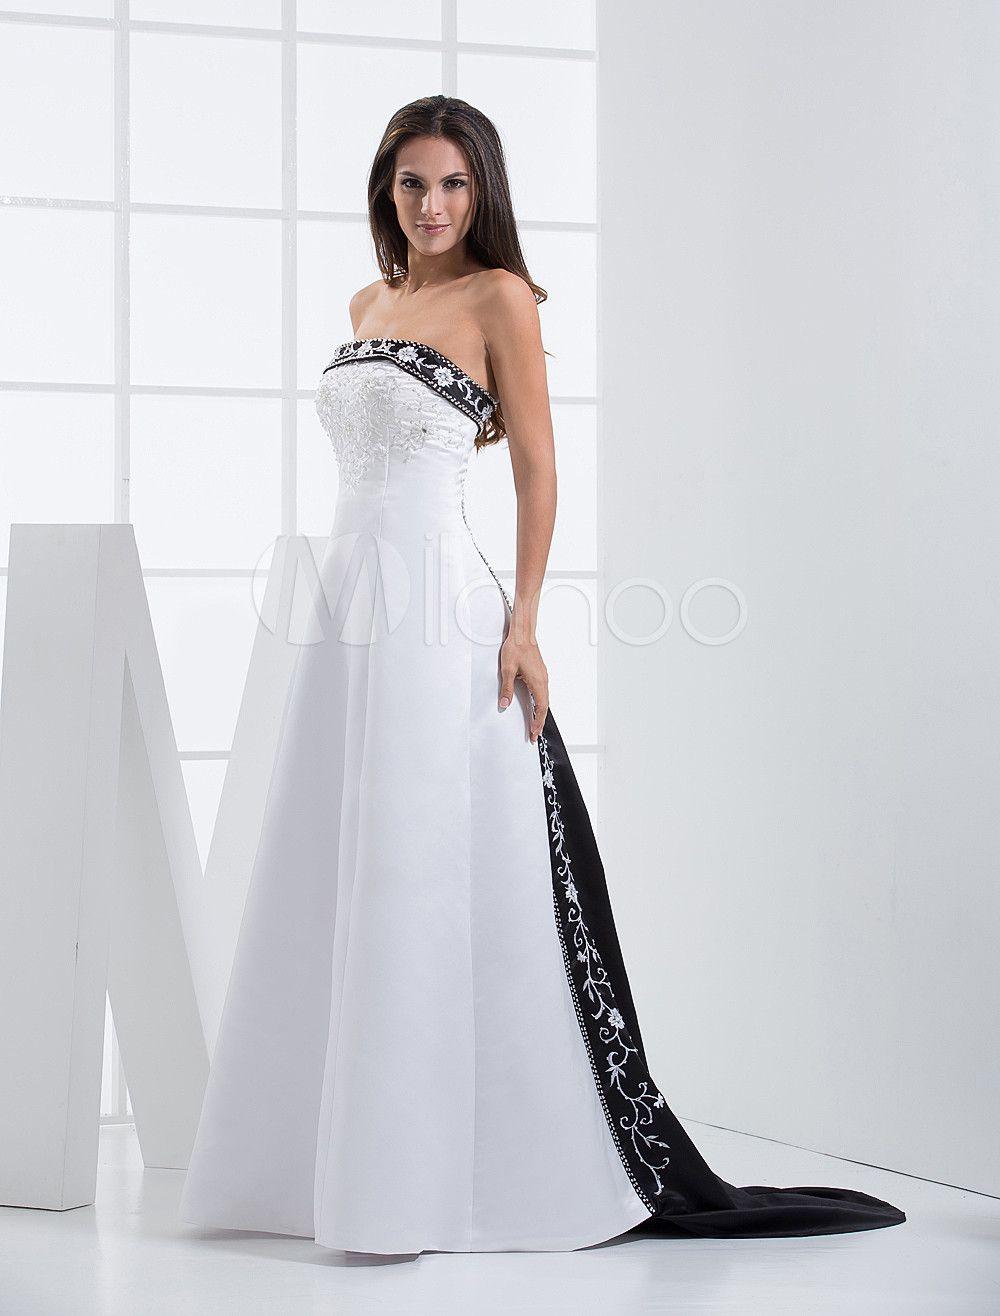 7ef1fab6d3a1f Vestidos de novia sin tirantes de encaje bordado vestido de novia de ...